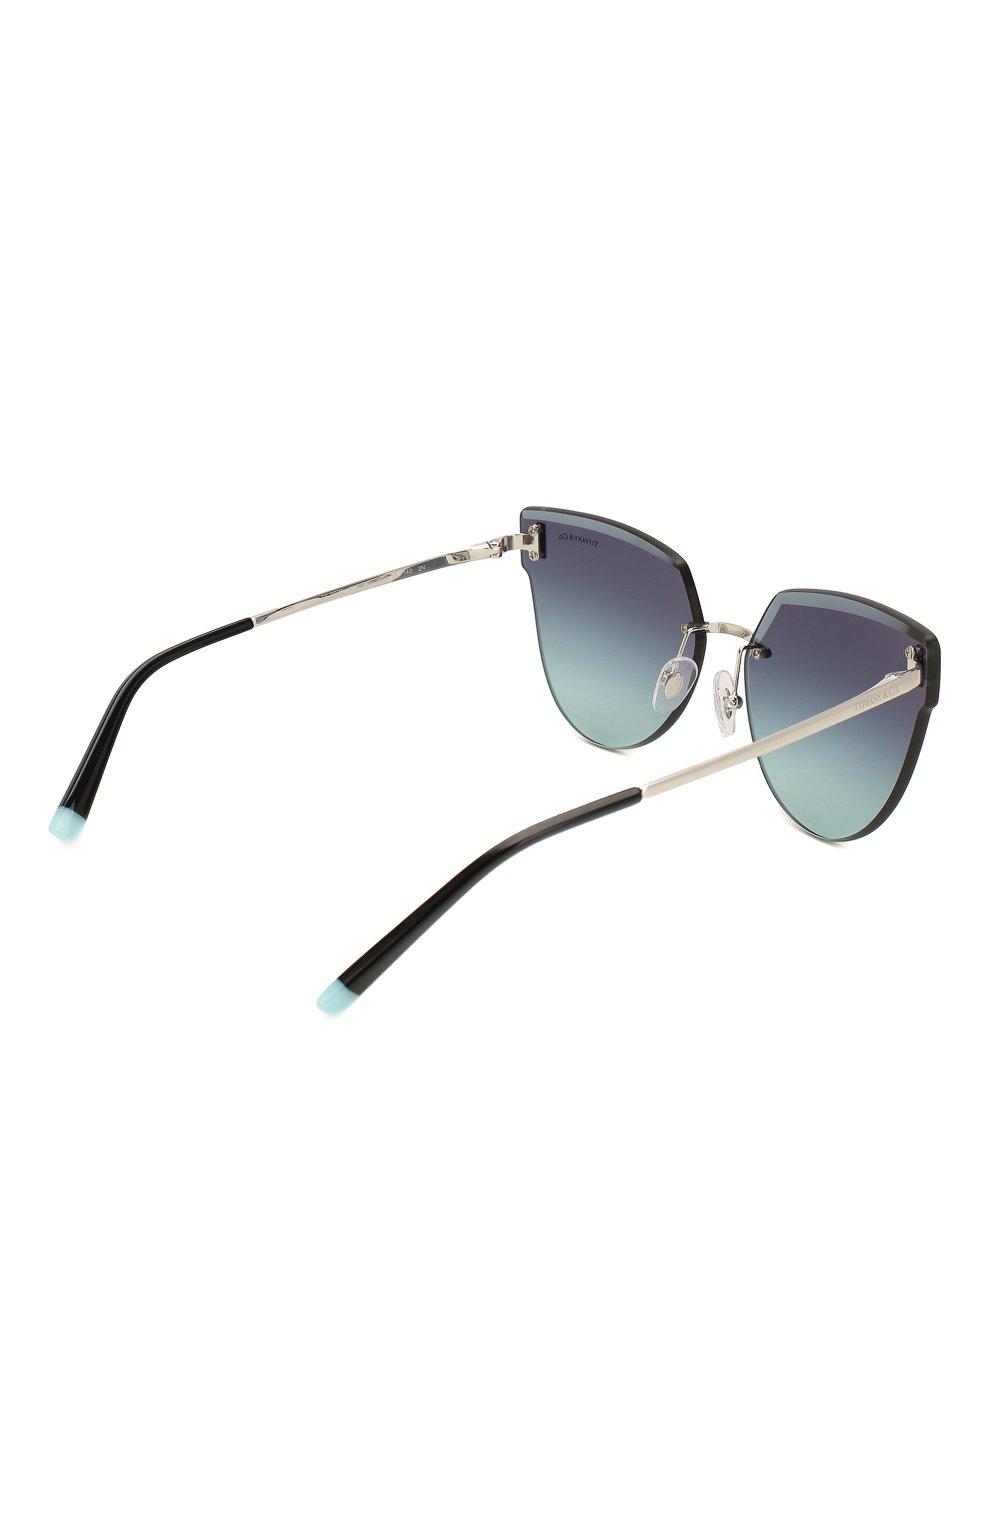 Женские солнцезащитные очки TIFFANY & CO. темно-синего цвета, арт. 3070-60019S | Фото 4